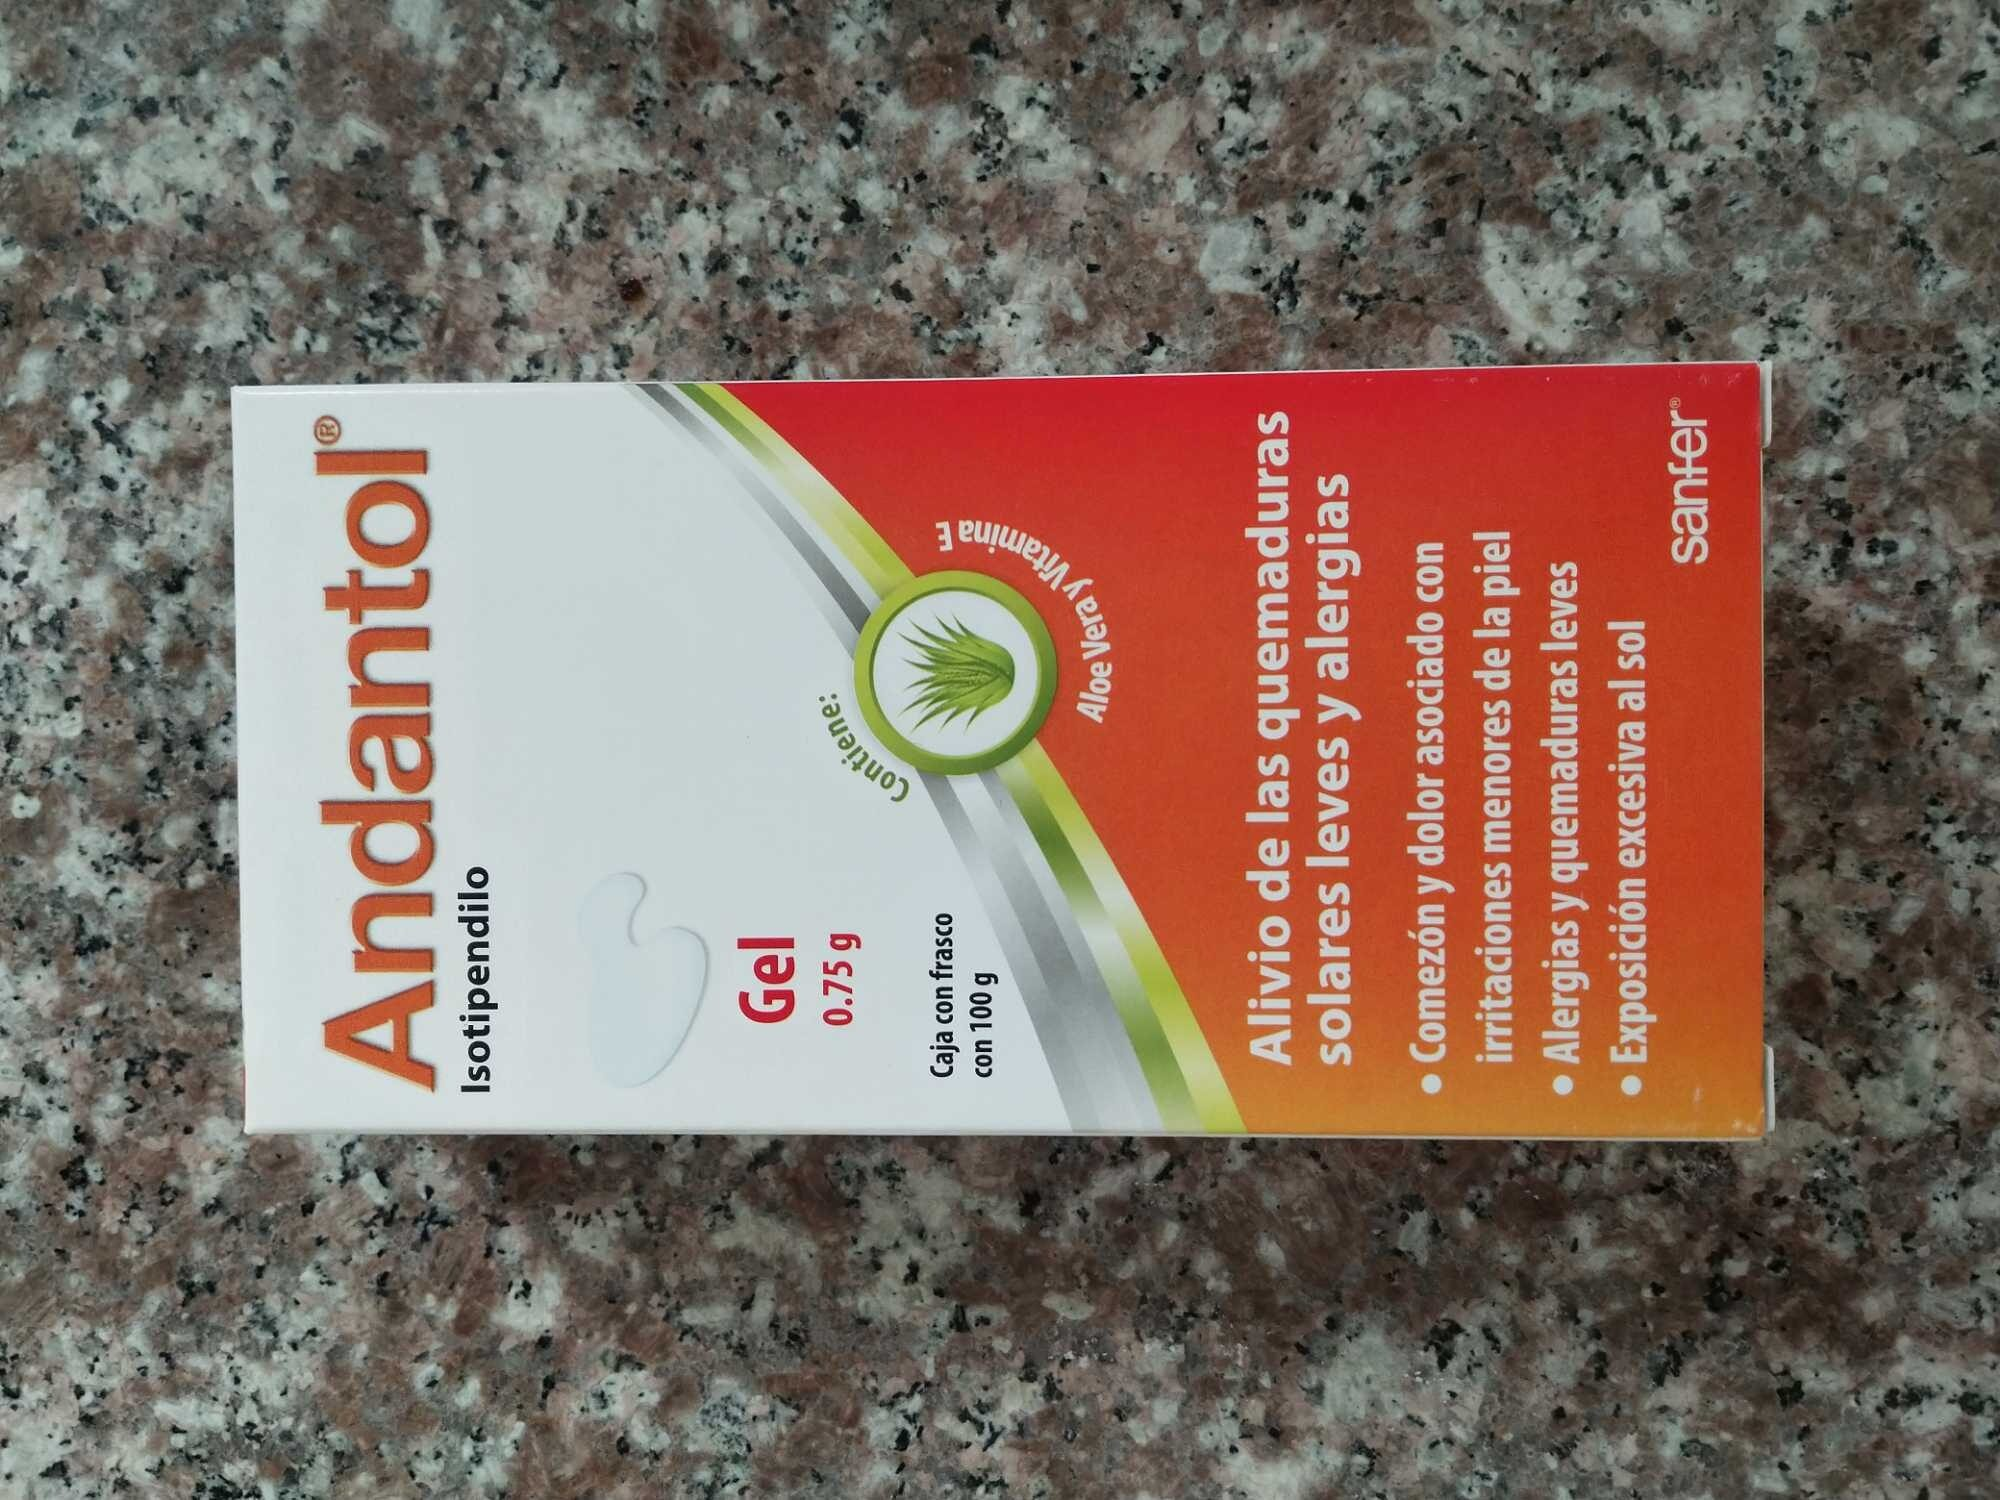 Andantol - Product